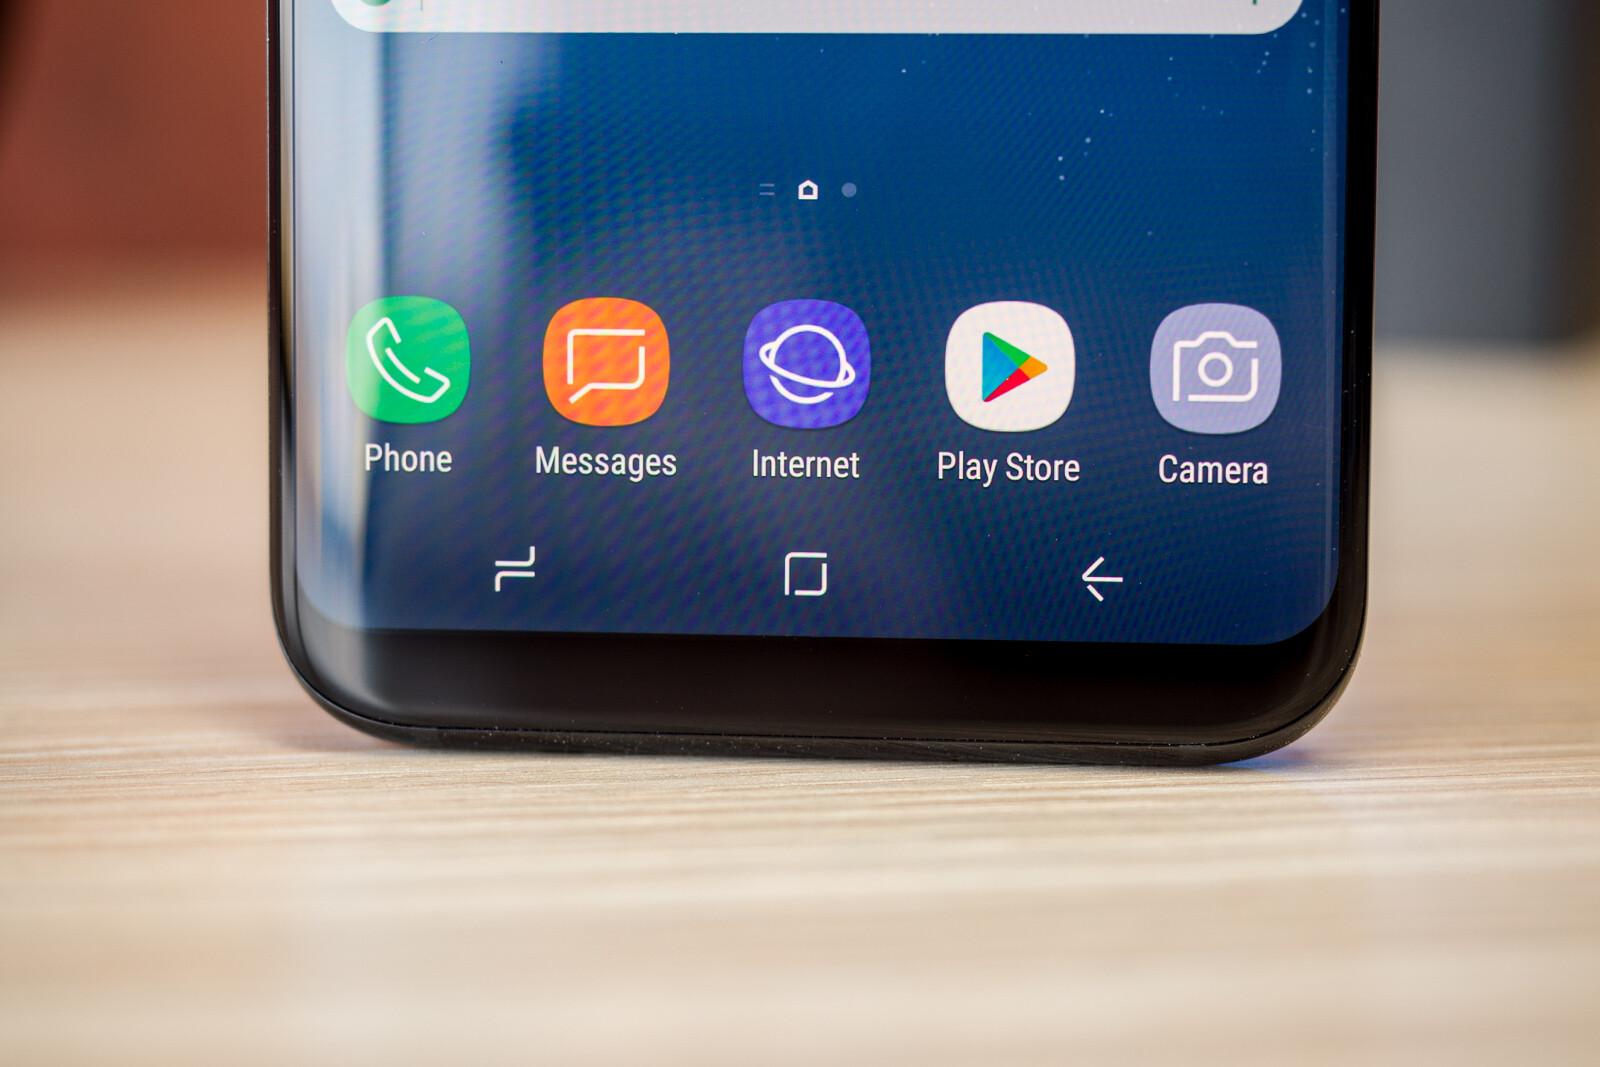 Samsung Galaxy Tab E 8.0 gets Android Nougat on Verizon